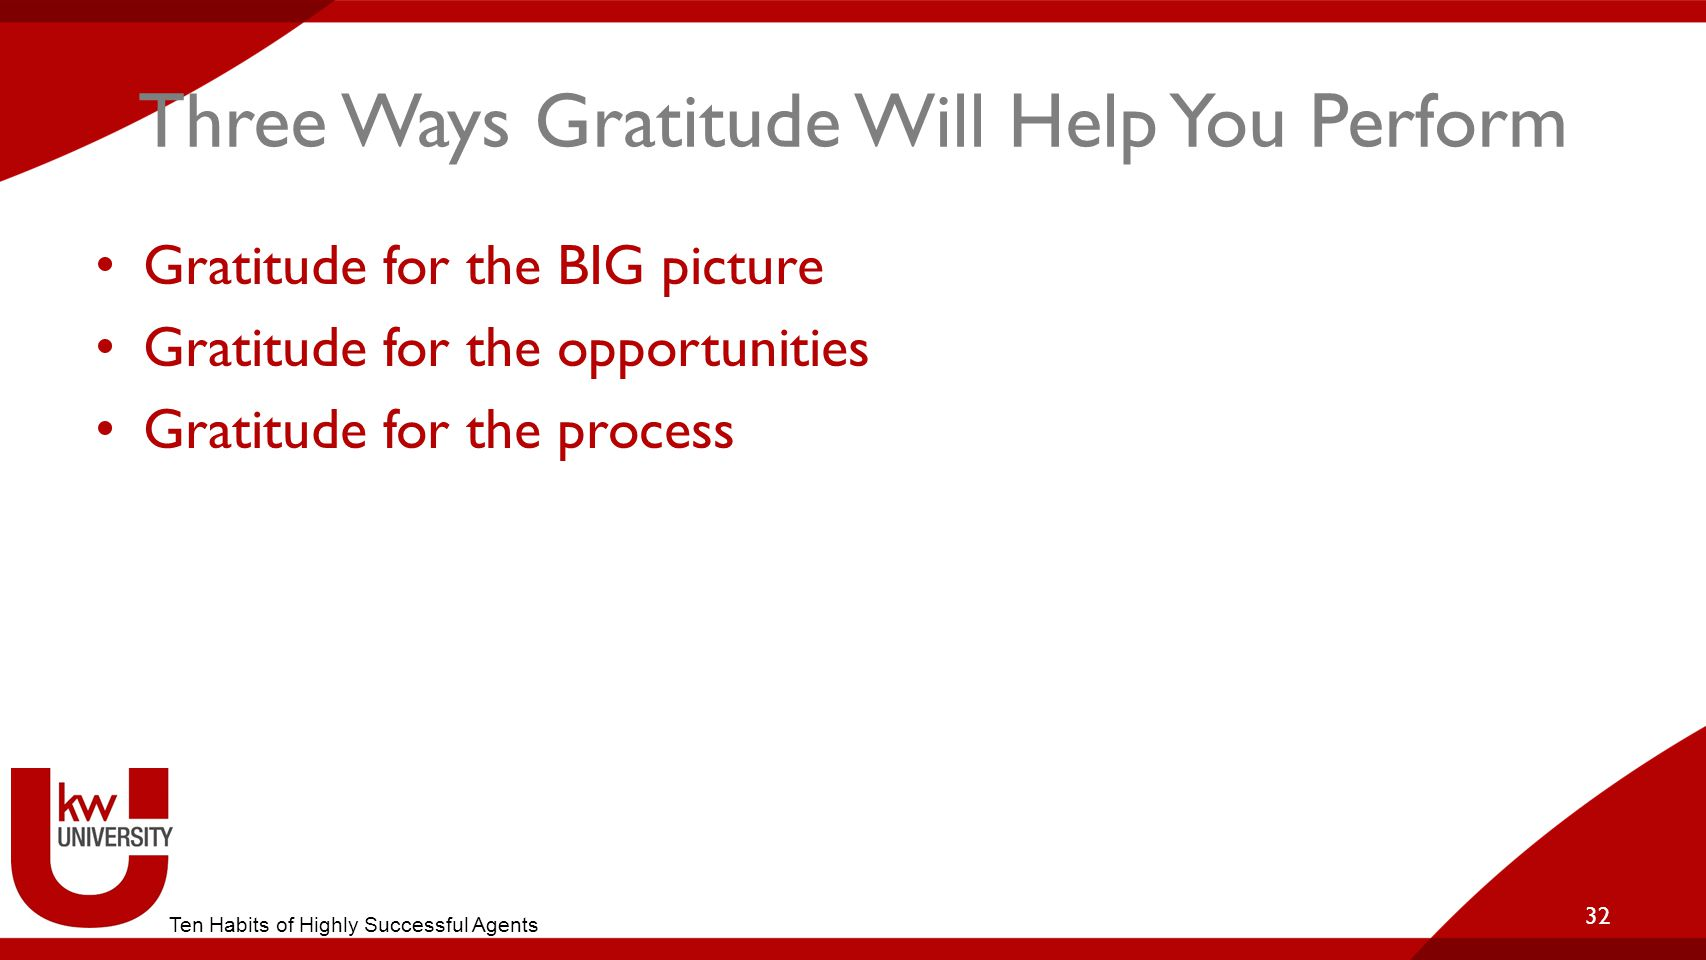 Three Ways Gratitude Will Help You Perform